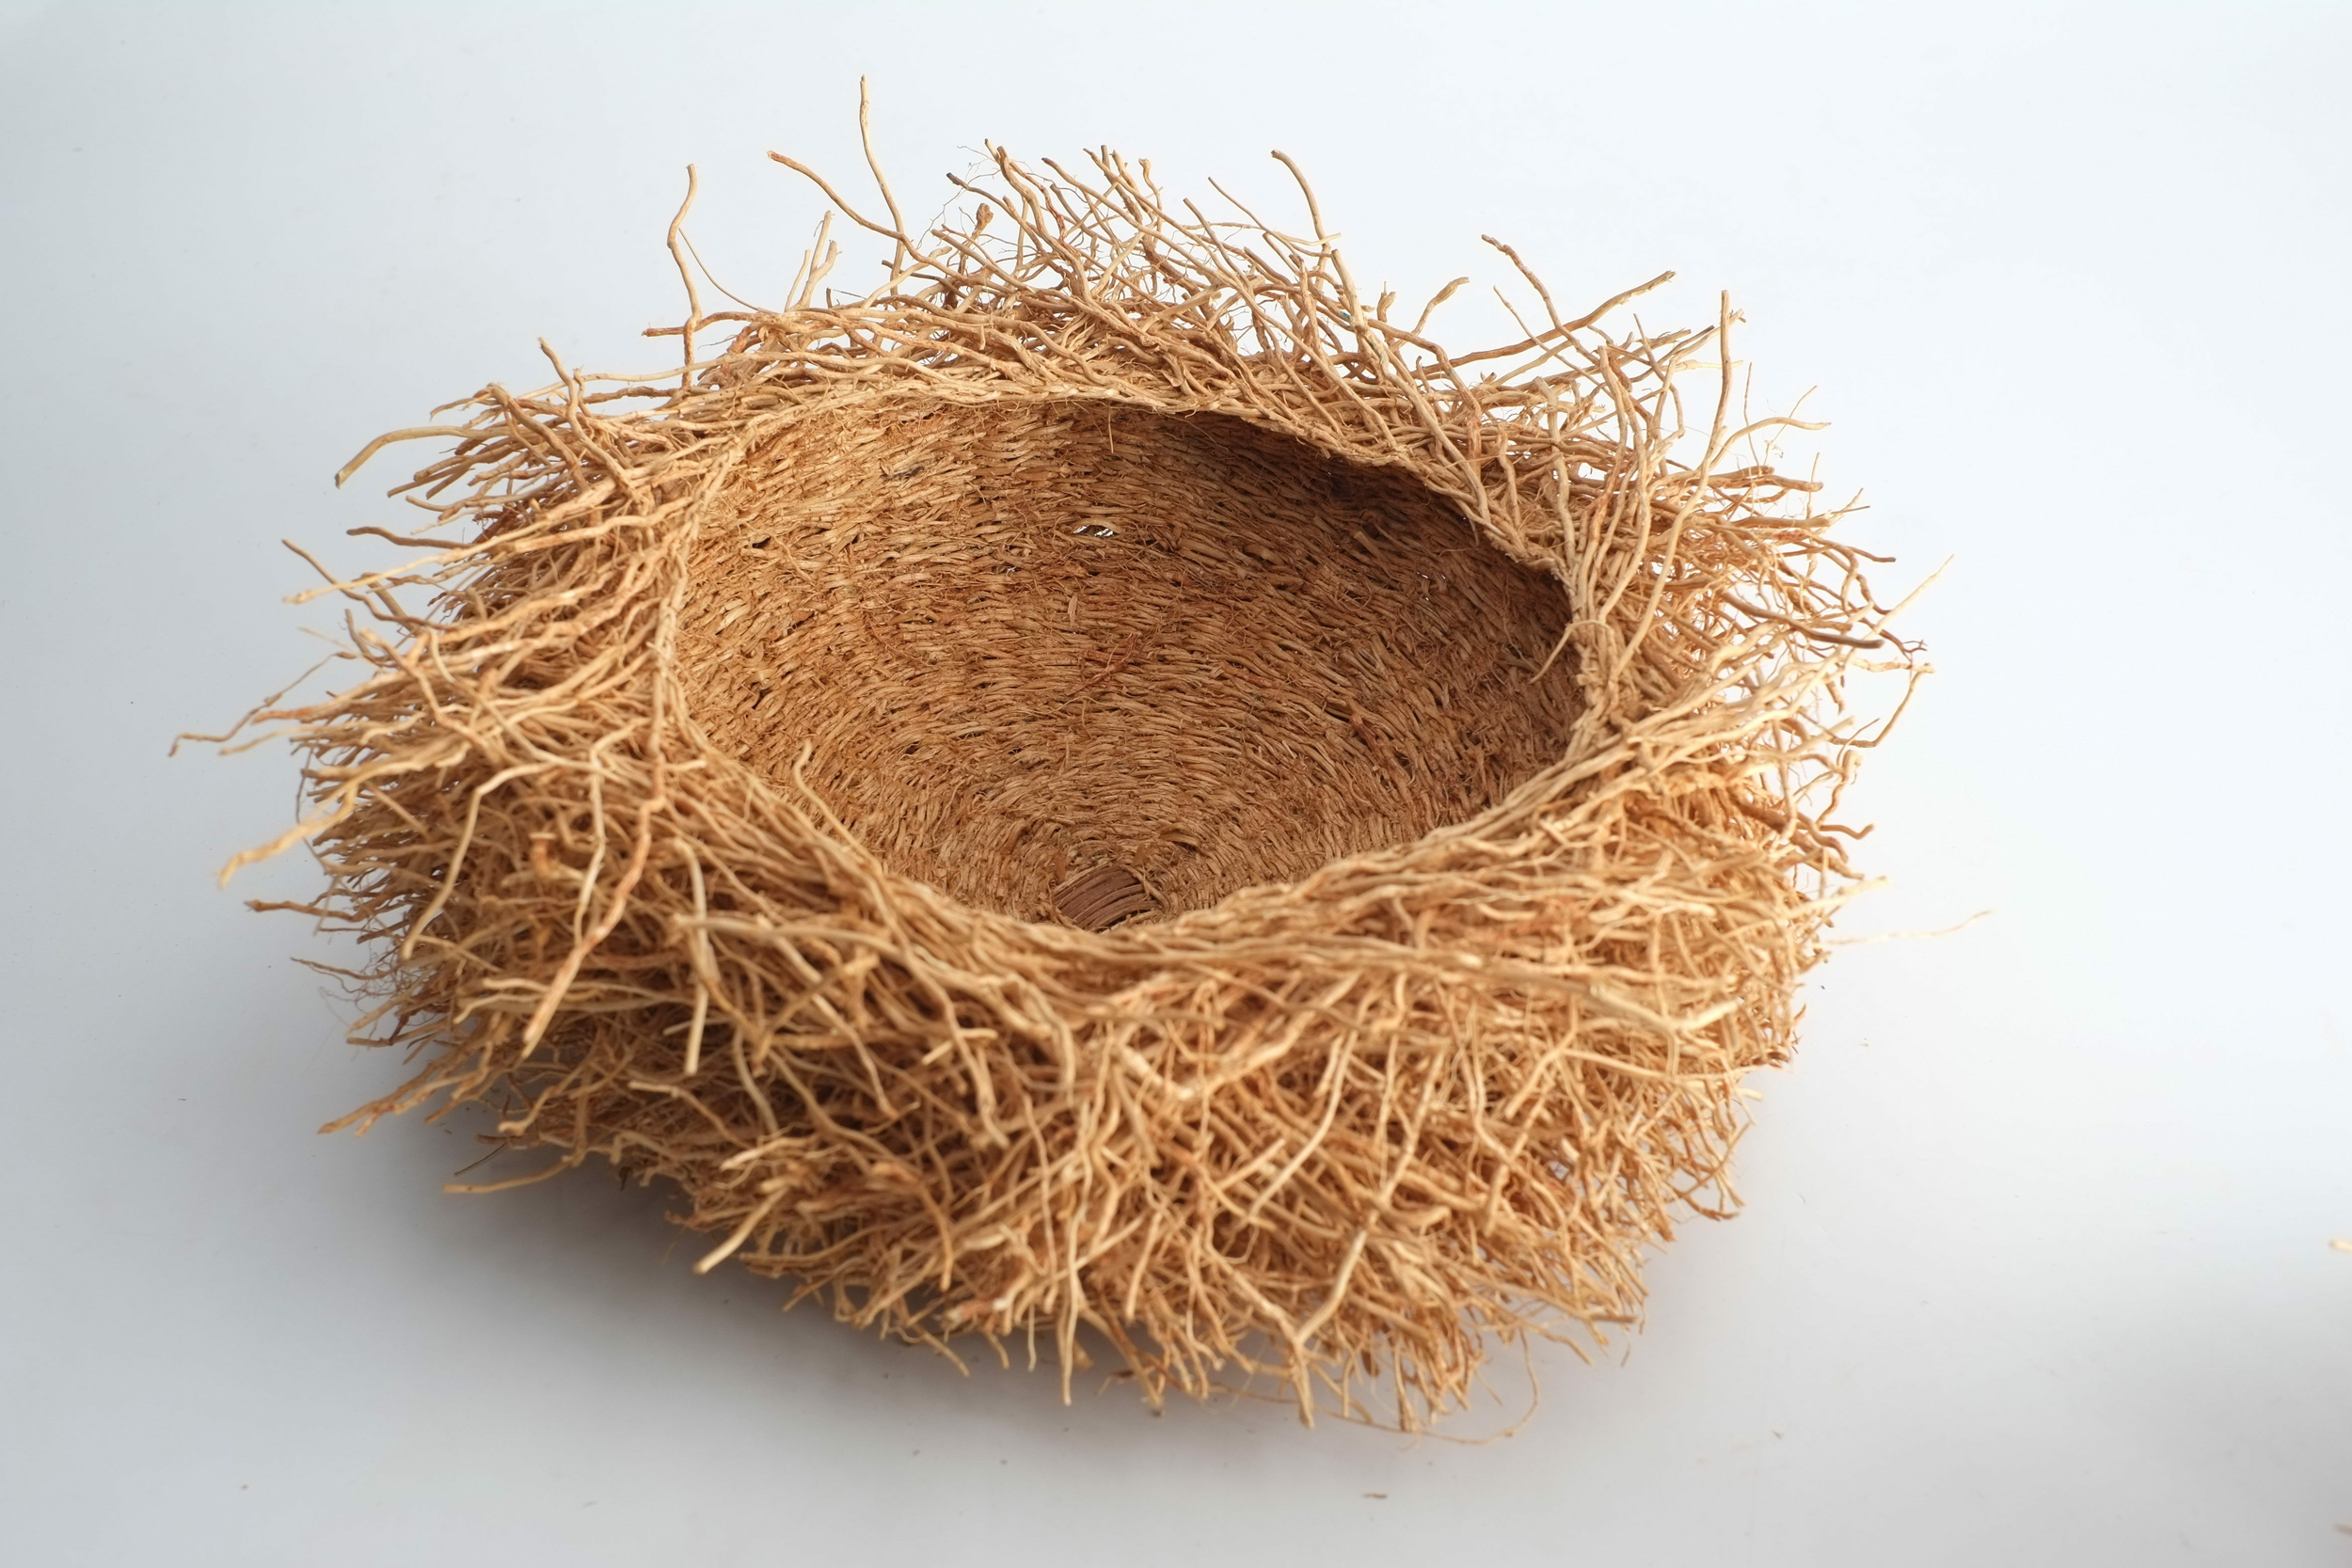 Nid décoratif et odorant en vétiver de Madagascar